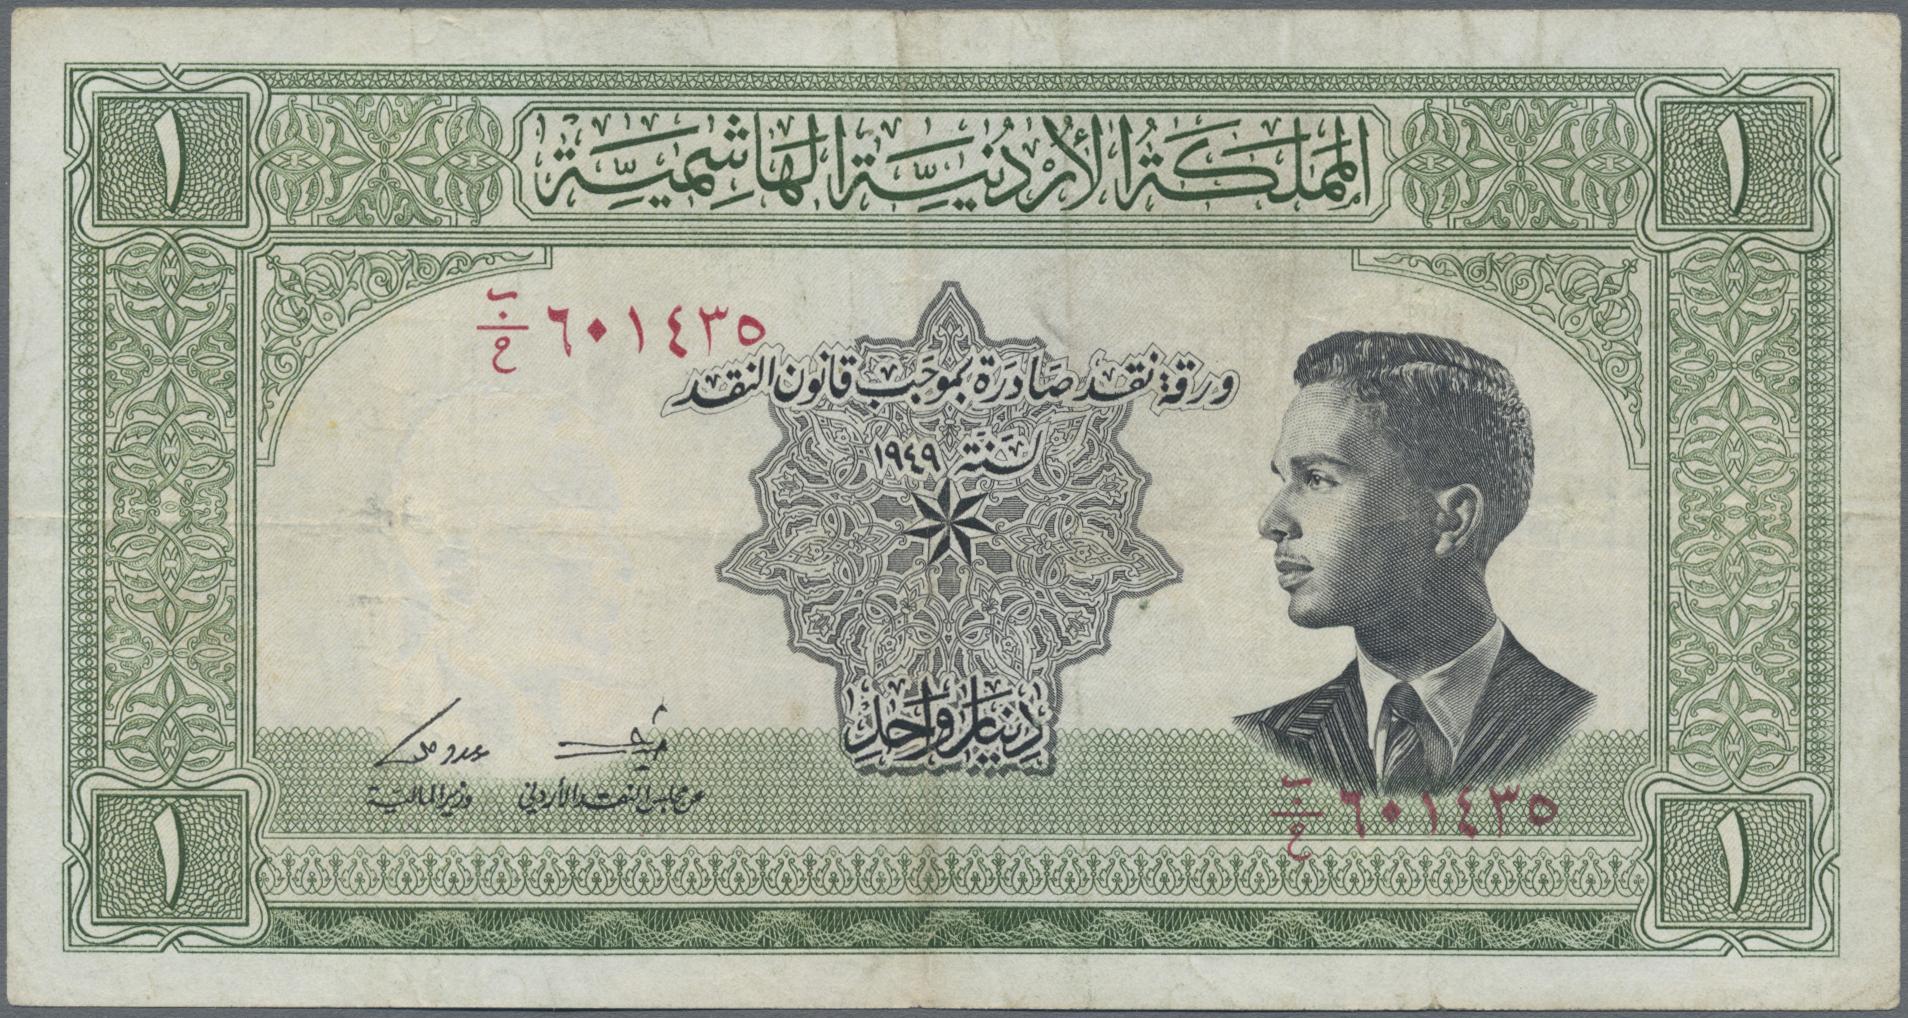 Lot 00483 - Jordan / Jordanien | Banknoten  -  Auktionshaus Christoph Gärtner GmbH & Co. KG Sale #48 The Banknotes